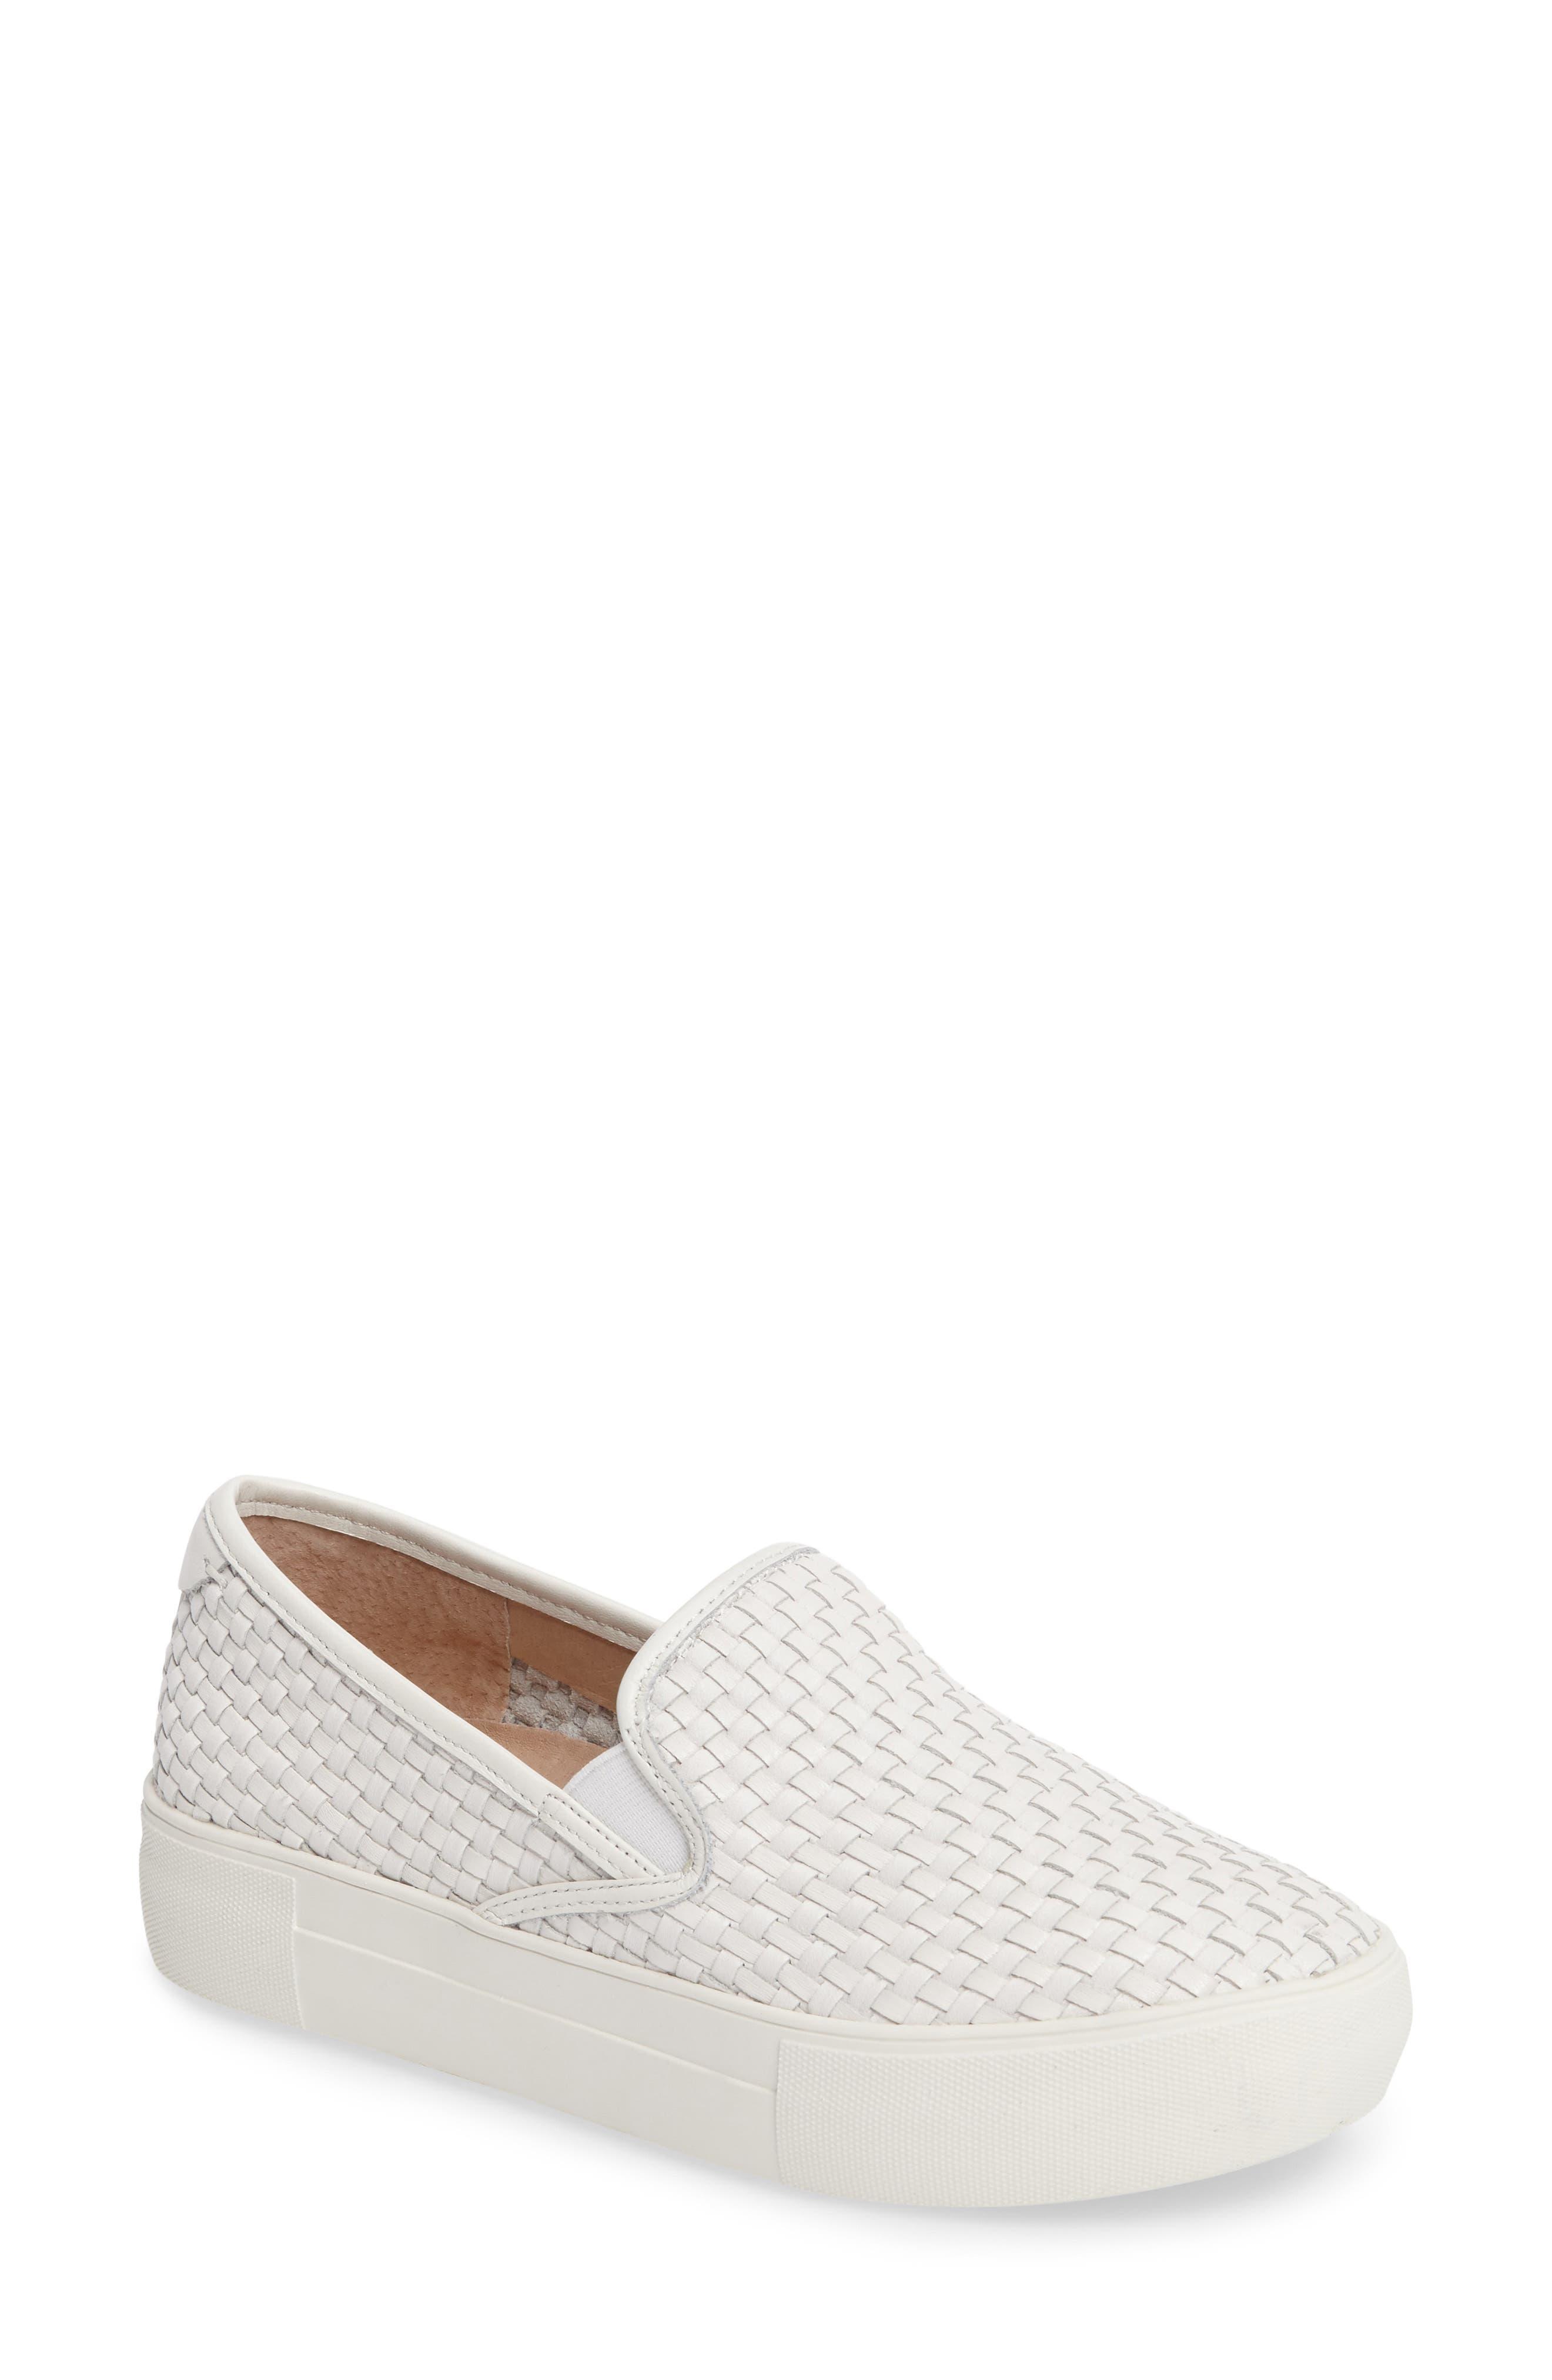 Alyssa Platform Slip-On Sneaker,                         Main,                         color, White Leather